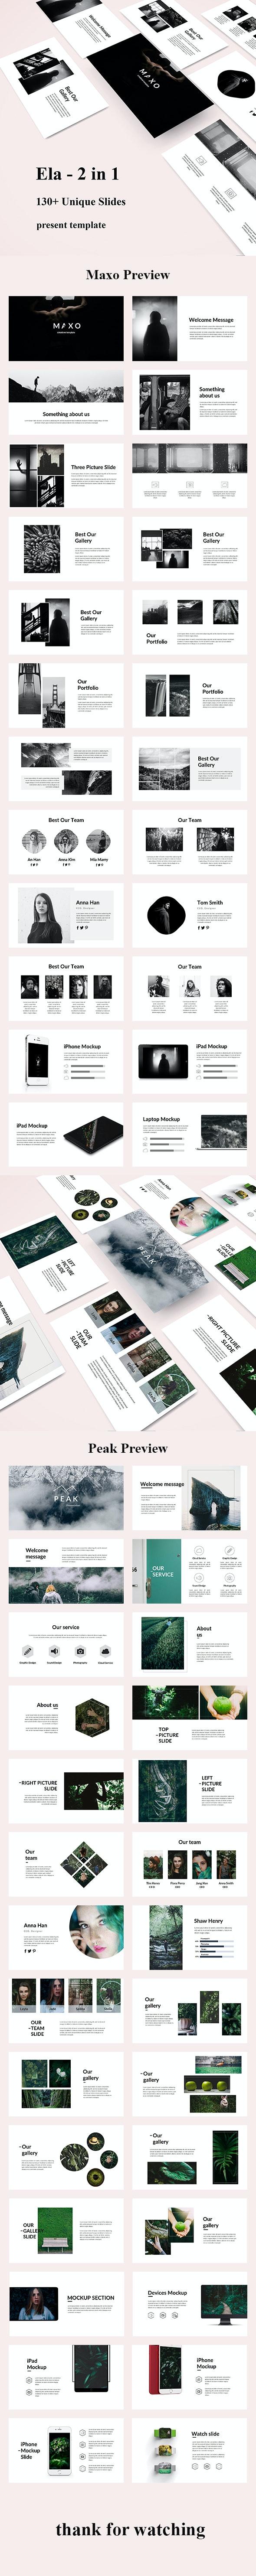 Ela 2 in 1 - Creative Powerpoint Template Bundle - Creative PowerPoint Templates